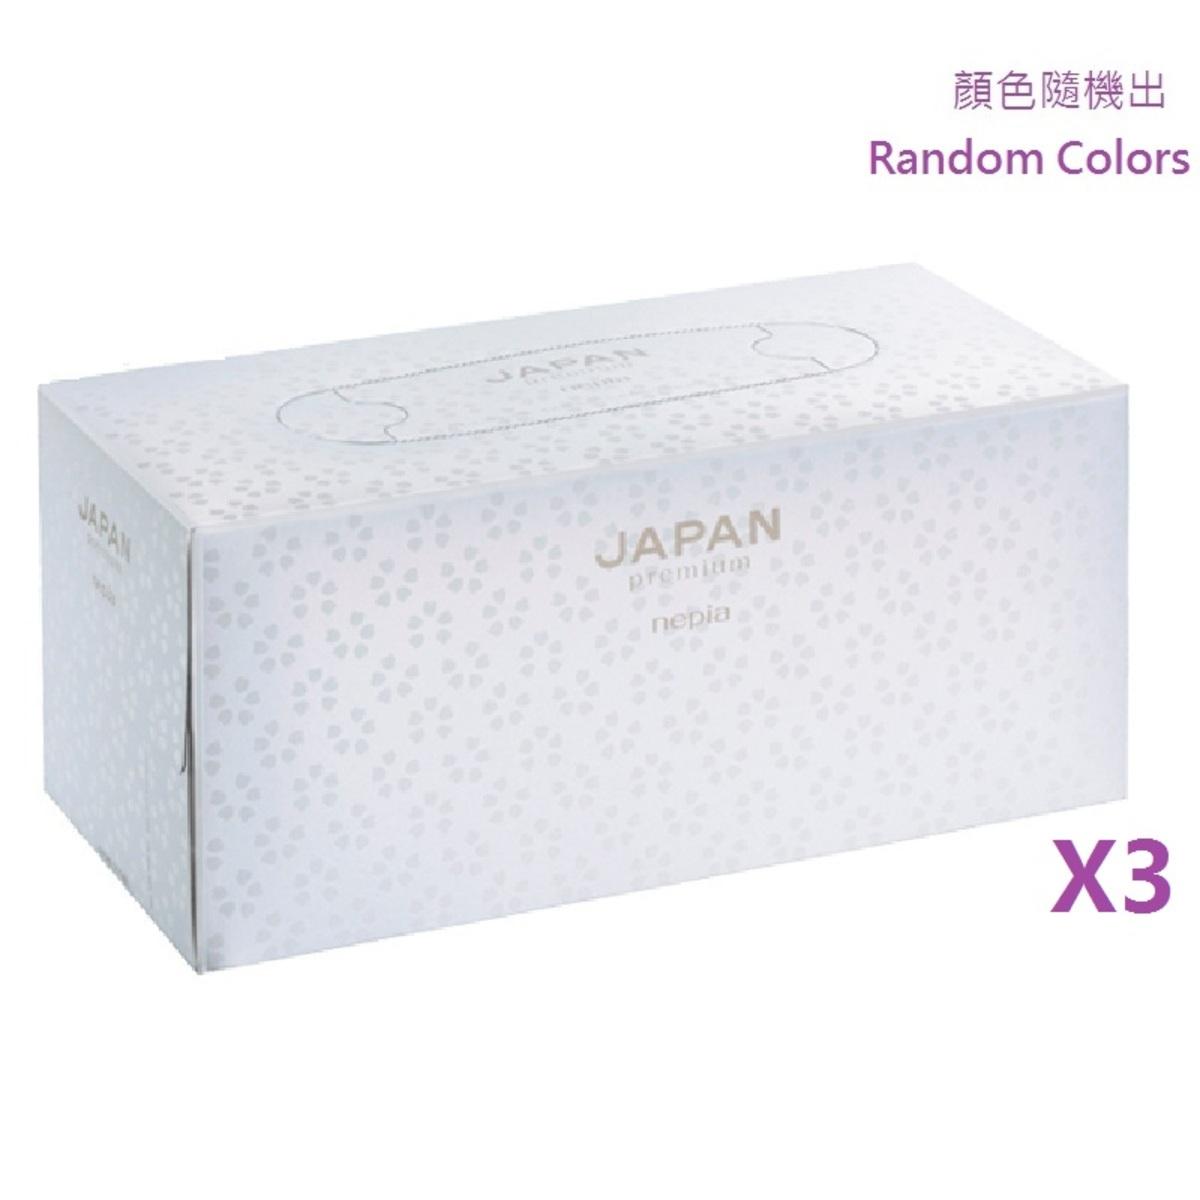 Nepia Japan Premium Soft Nasal Sensitive Paper (Random Colors) 220pcsX3